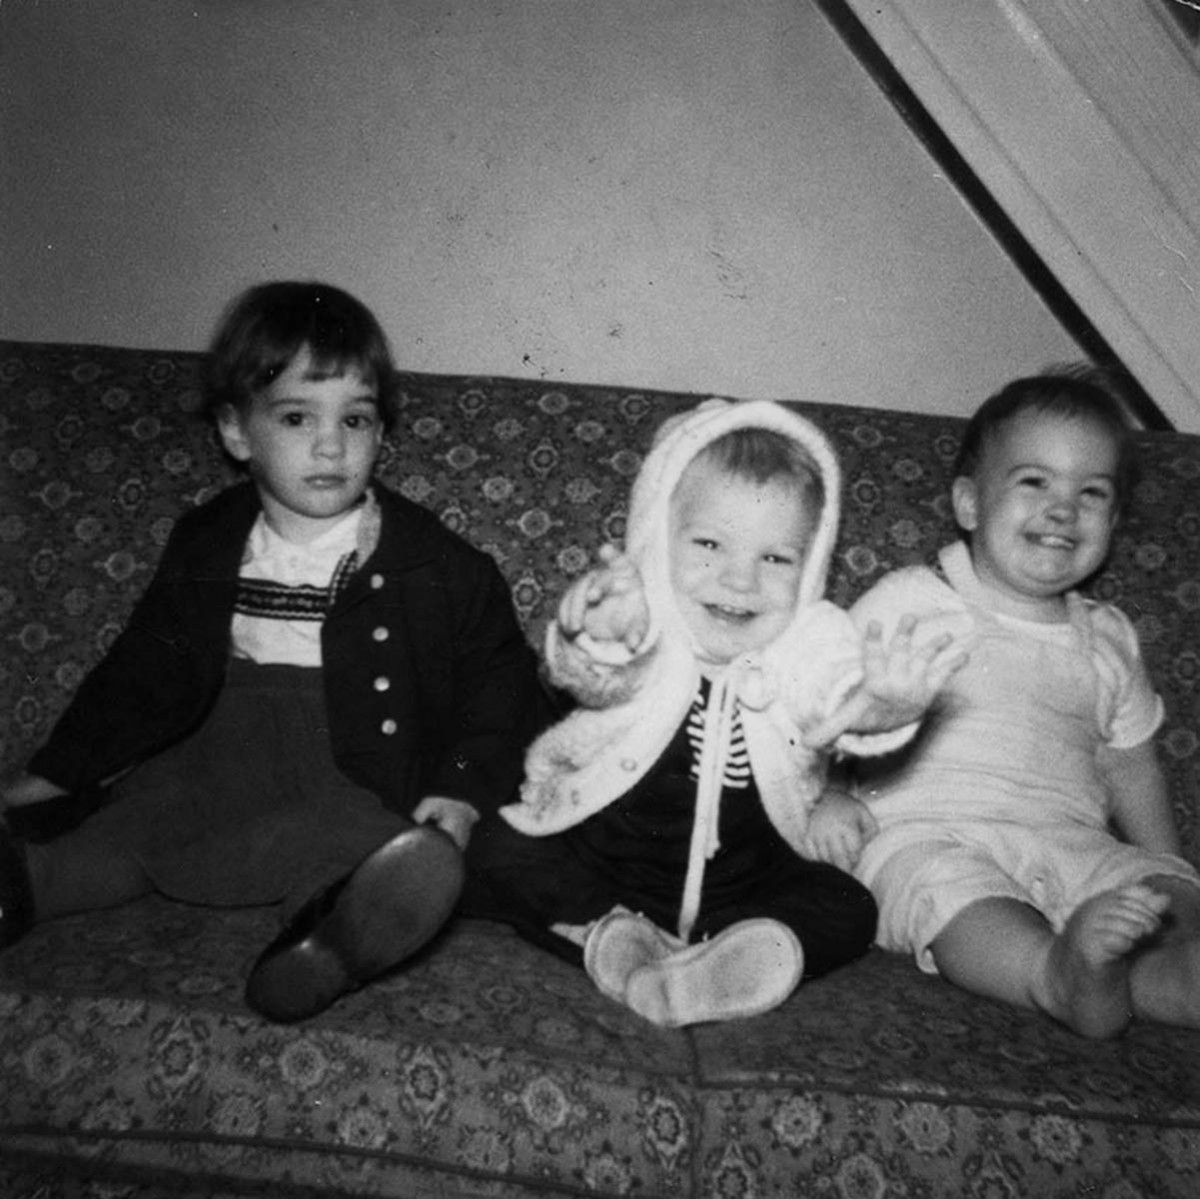 Conlon // County Monaghan :: Breige, Kevin and Séan Conlon at home in Germantown, Philadelphia c. 1962,